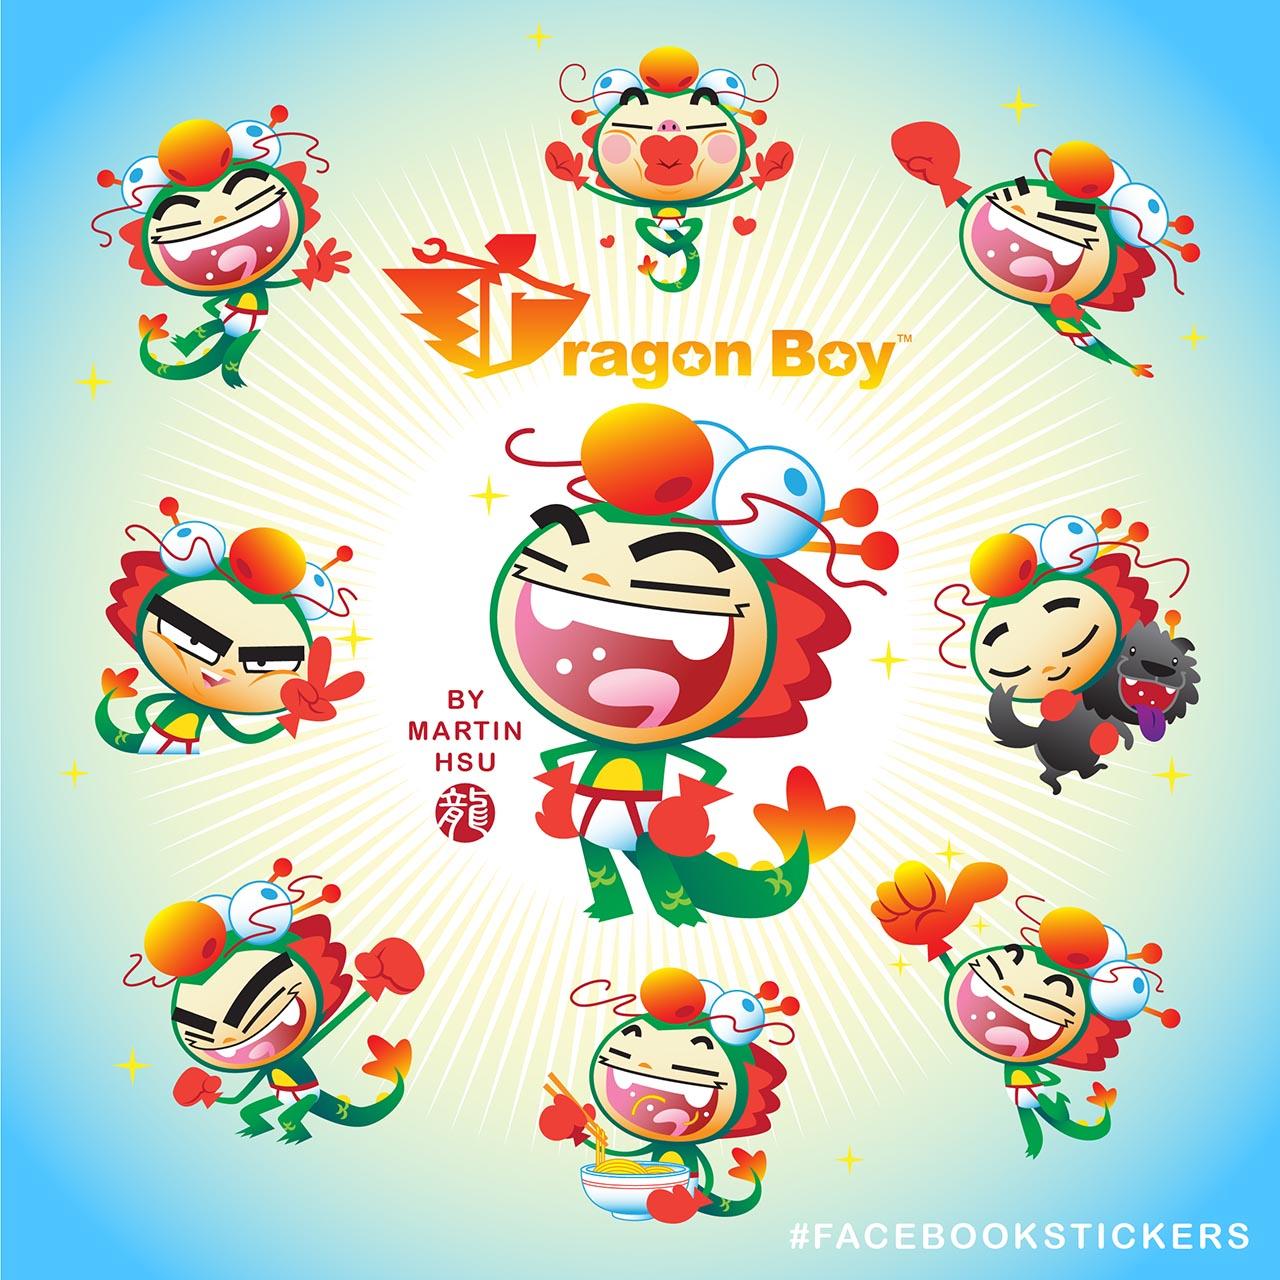 Martin Hsu's Dragon Boy Official Facebook Stickers Free For